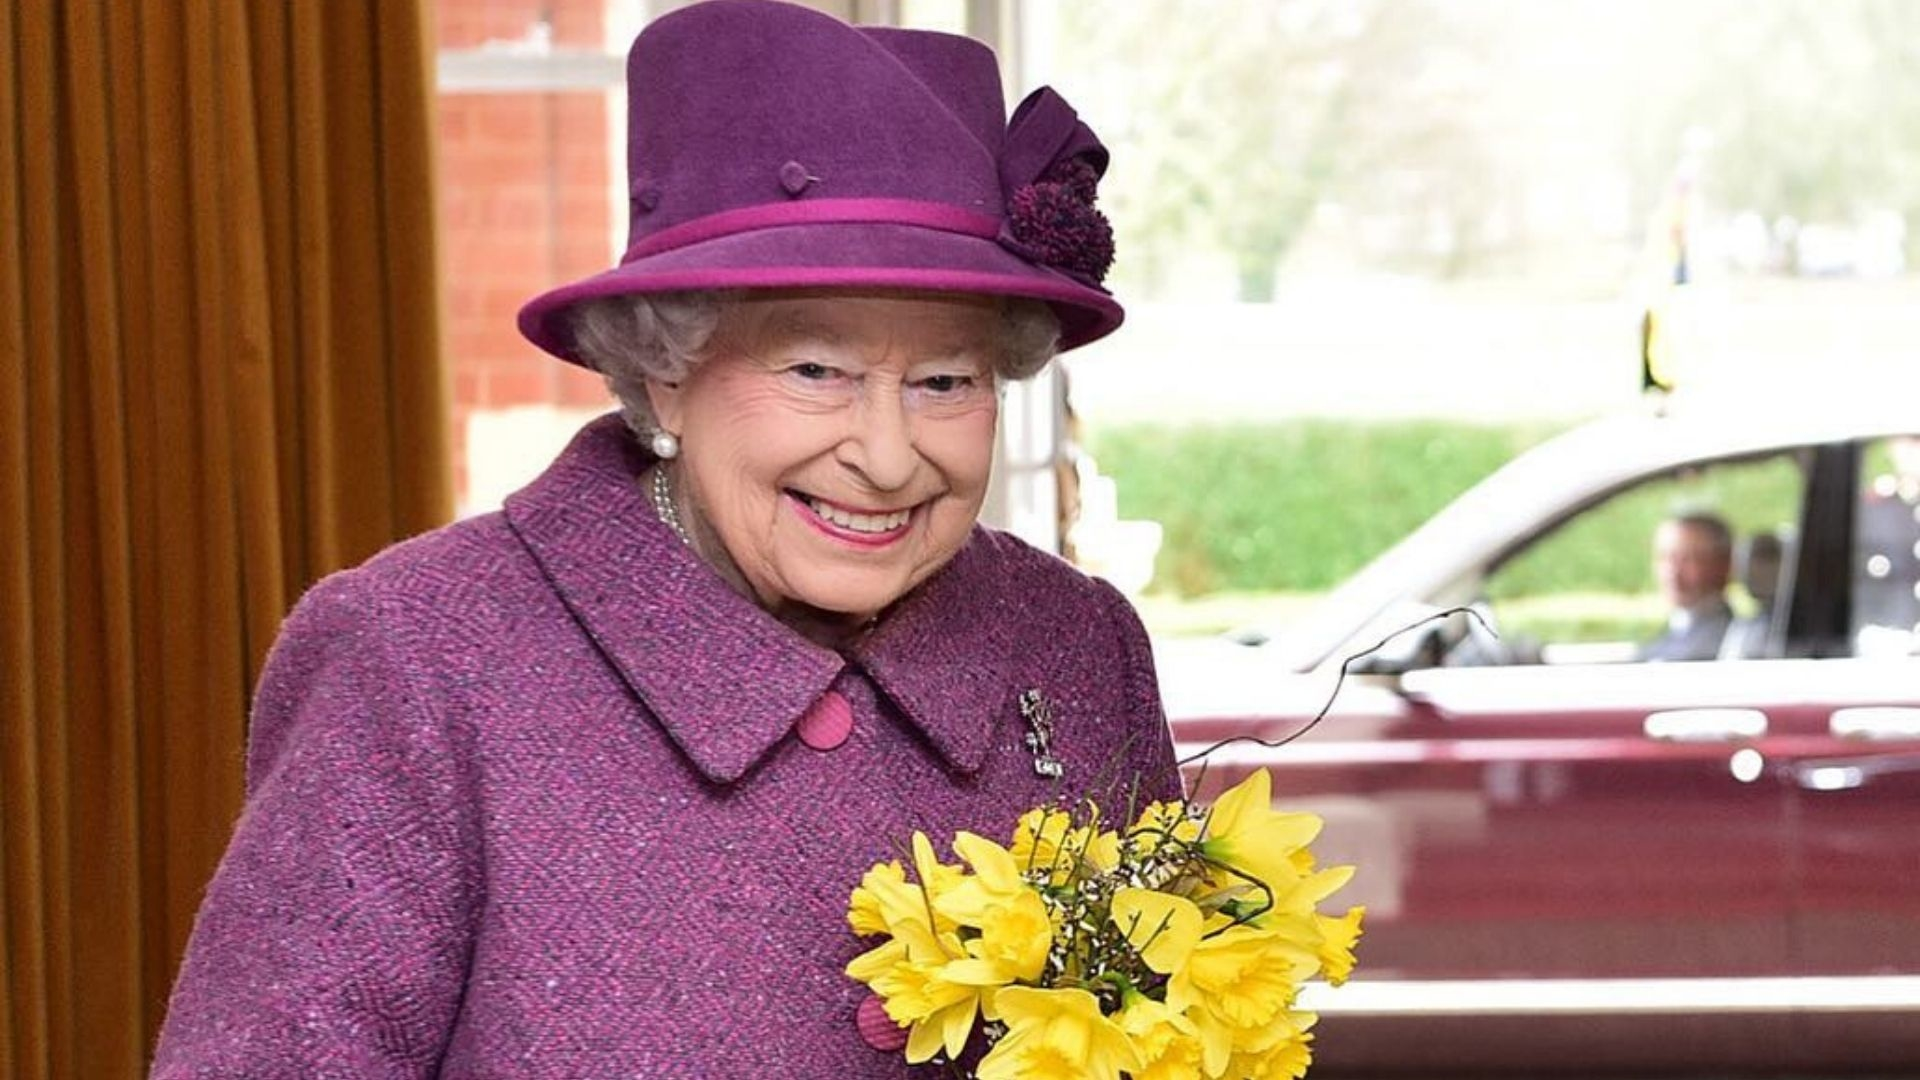 The Royal Family Responds To Rumours Surrounding Queen Elizabeth's Retirement